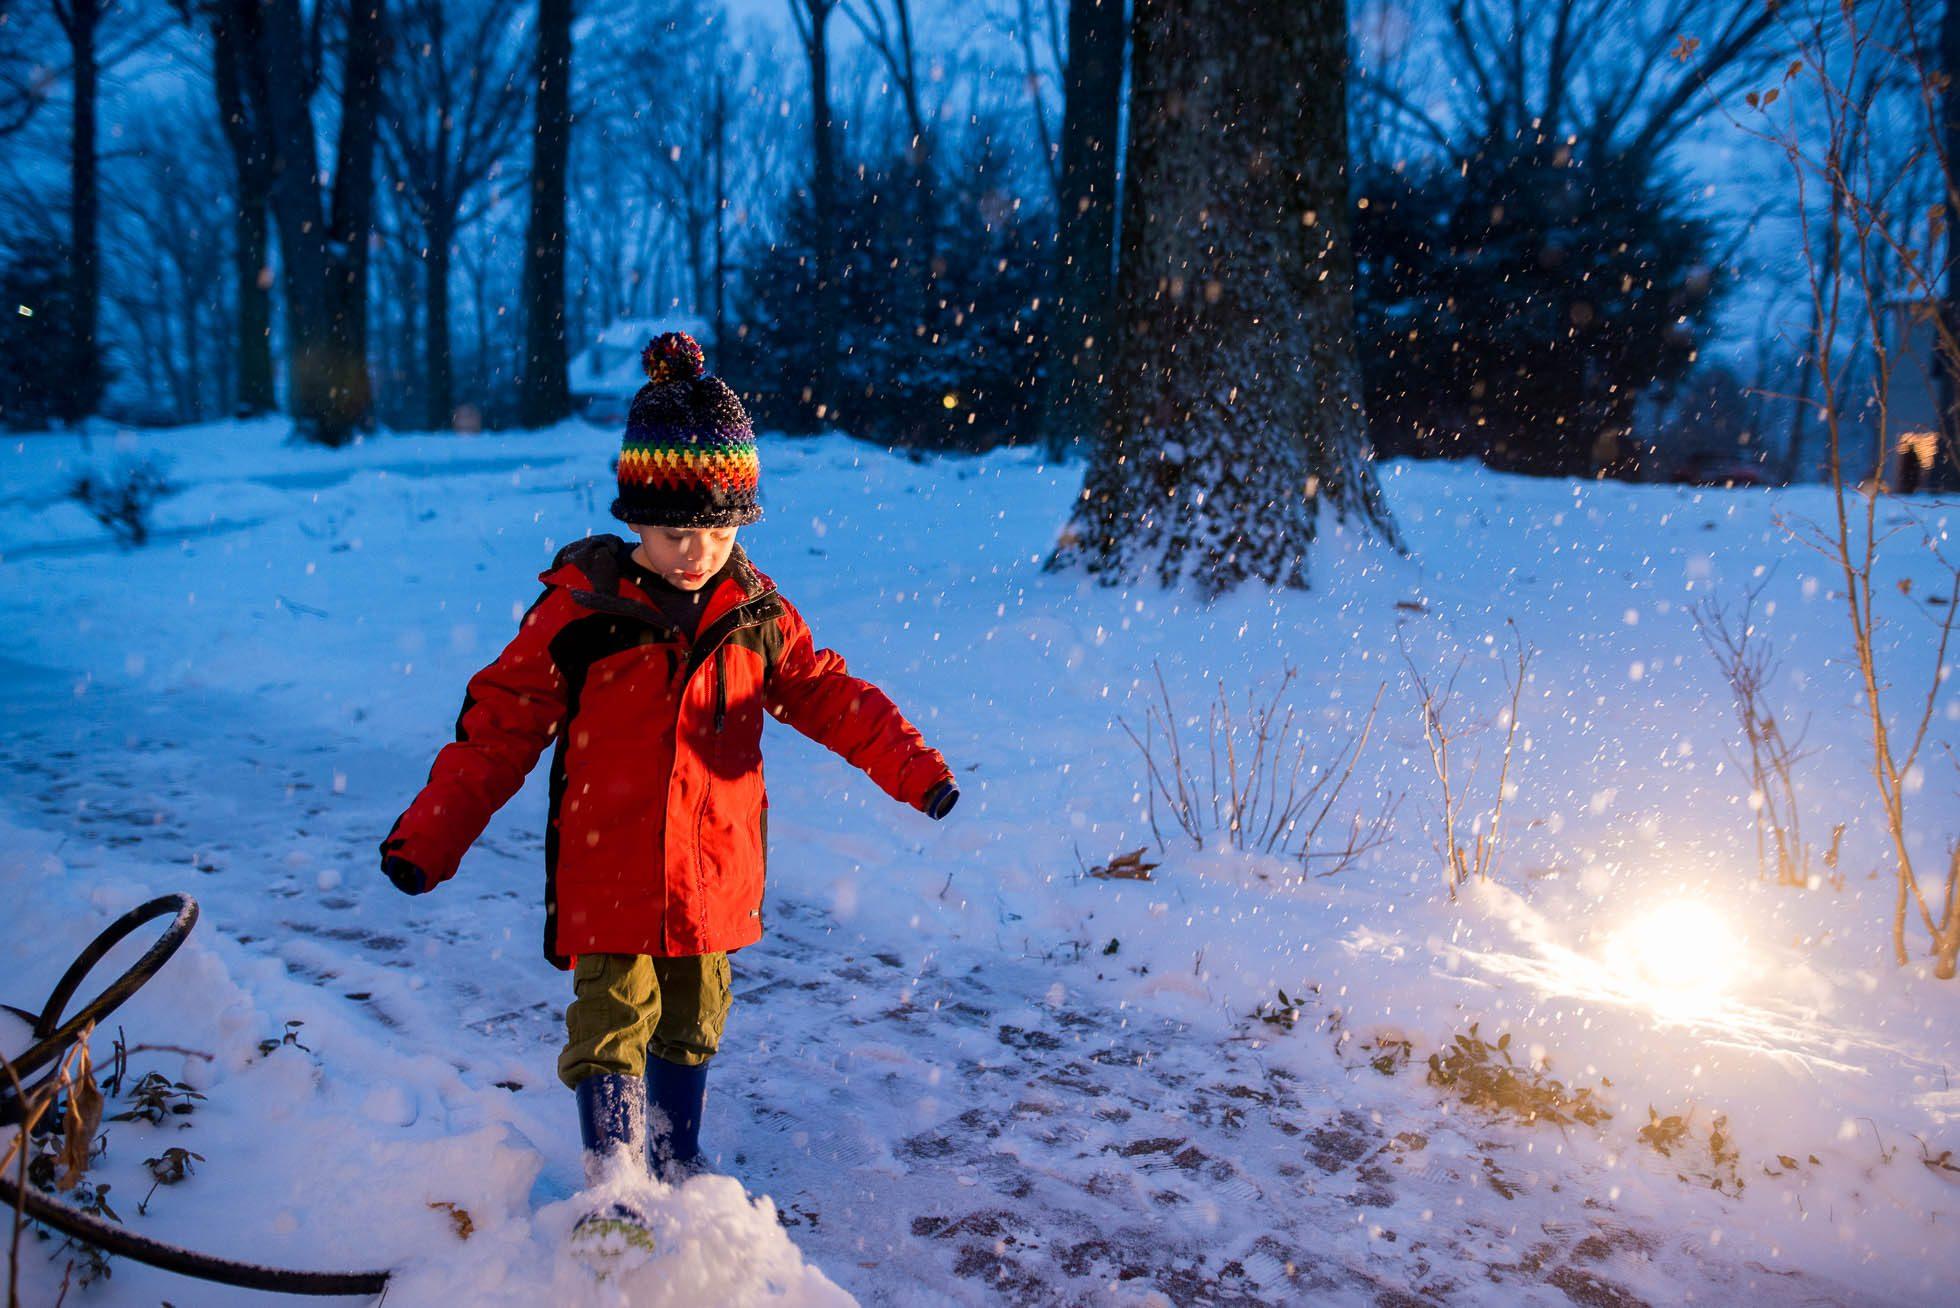 boy walking in falling snow in the evening